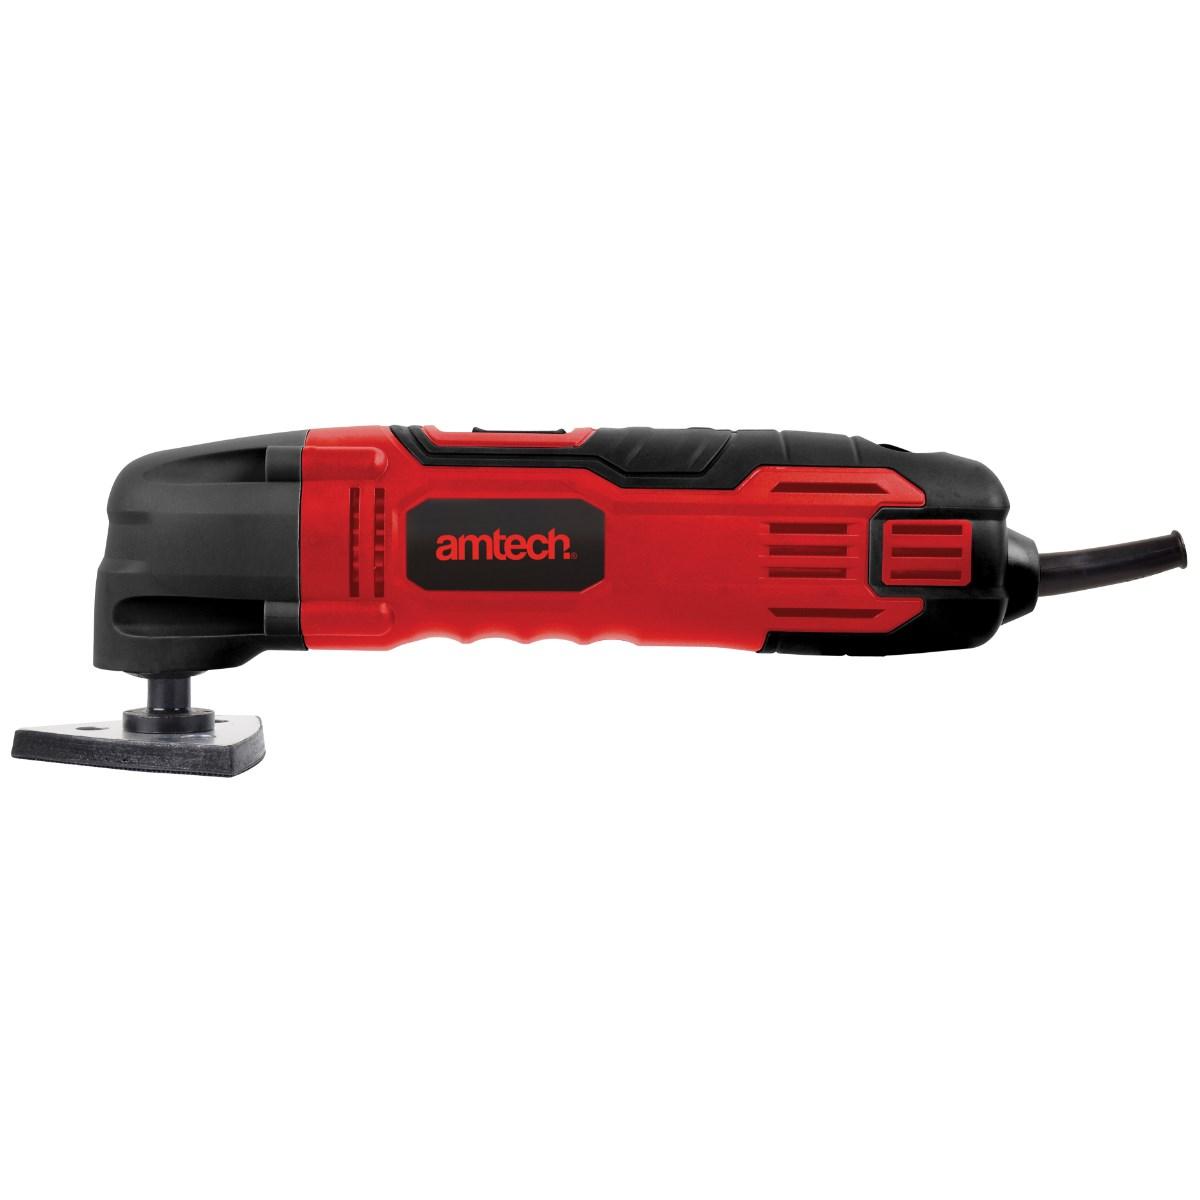 280W oscillating multi tool - Amtech